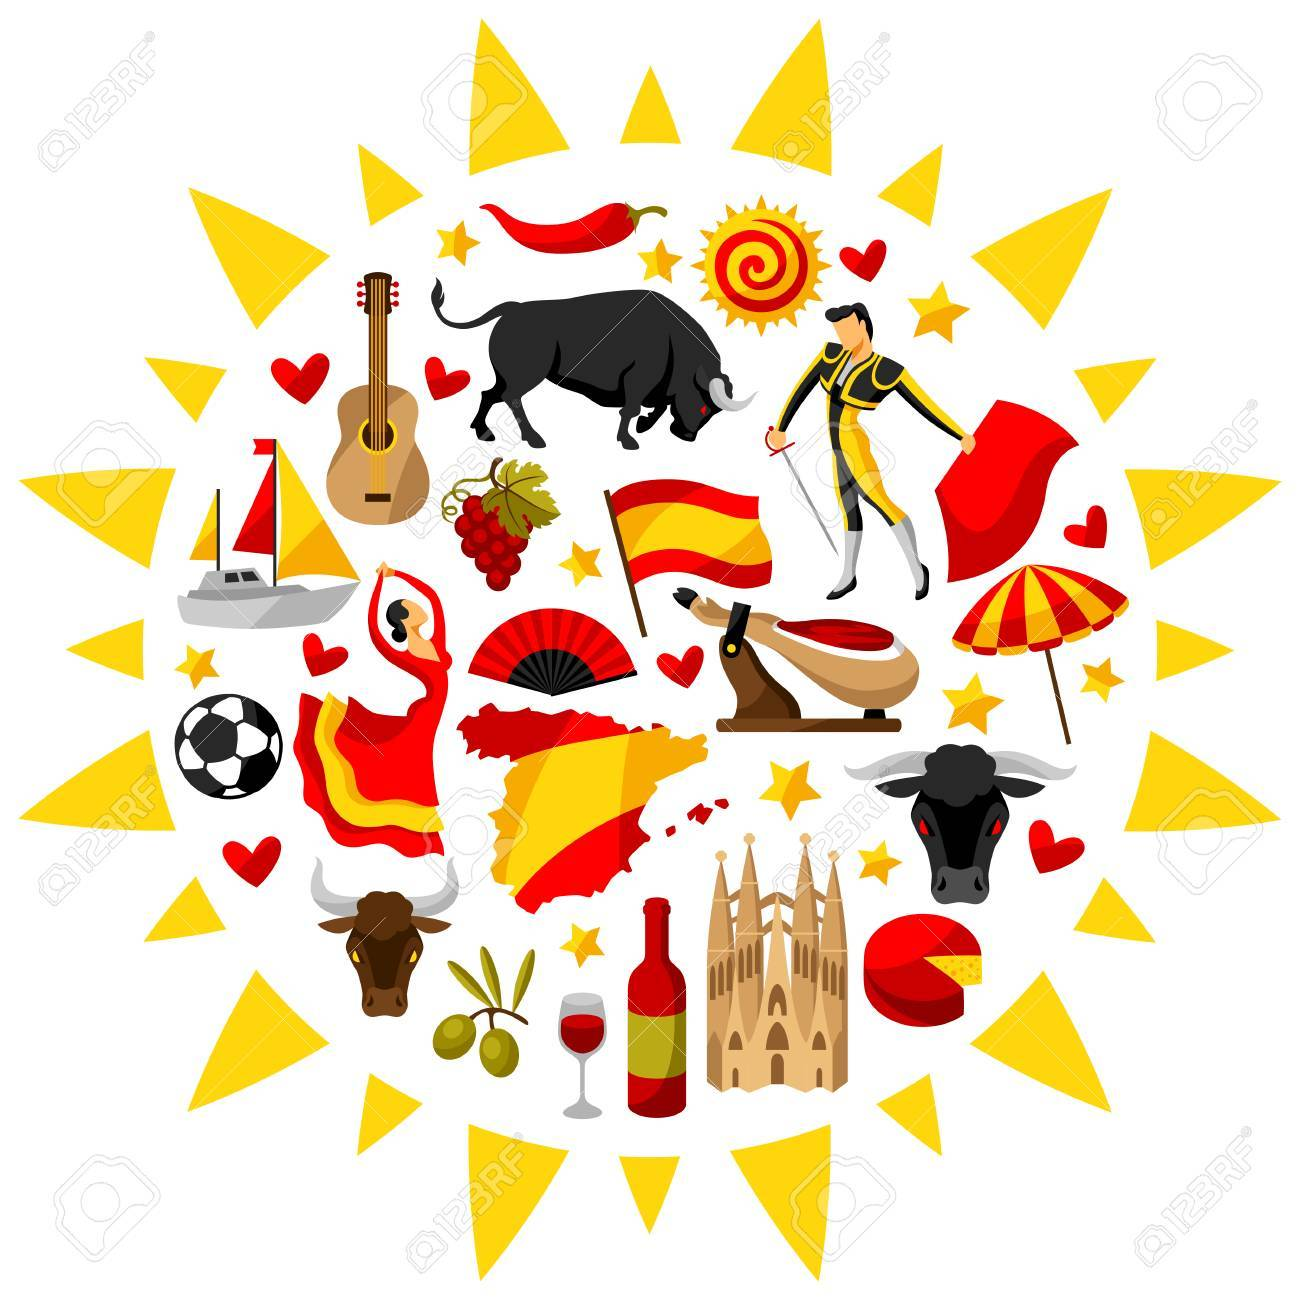 Spain background in shape of sun spanish traditional symbols spain background in shape of sun spanish traditional symbols and objects stock vector voltagebd Gallery